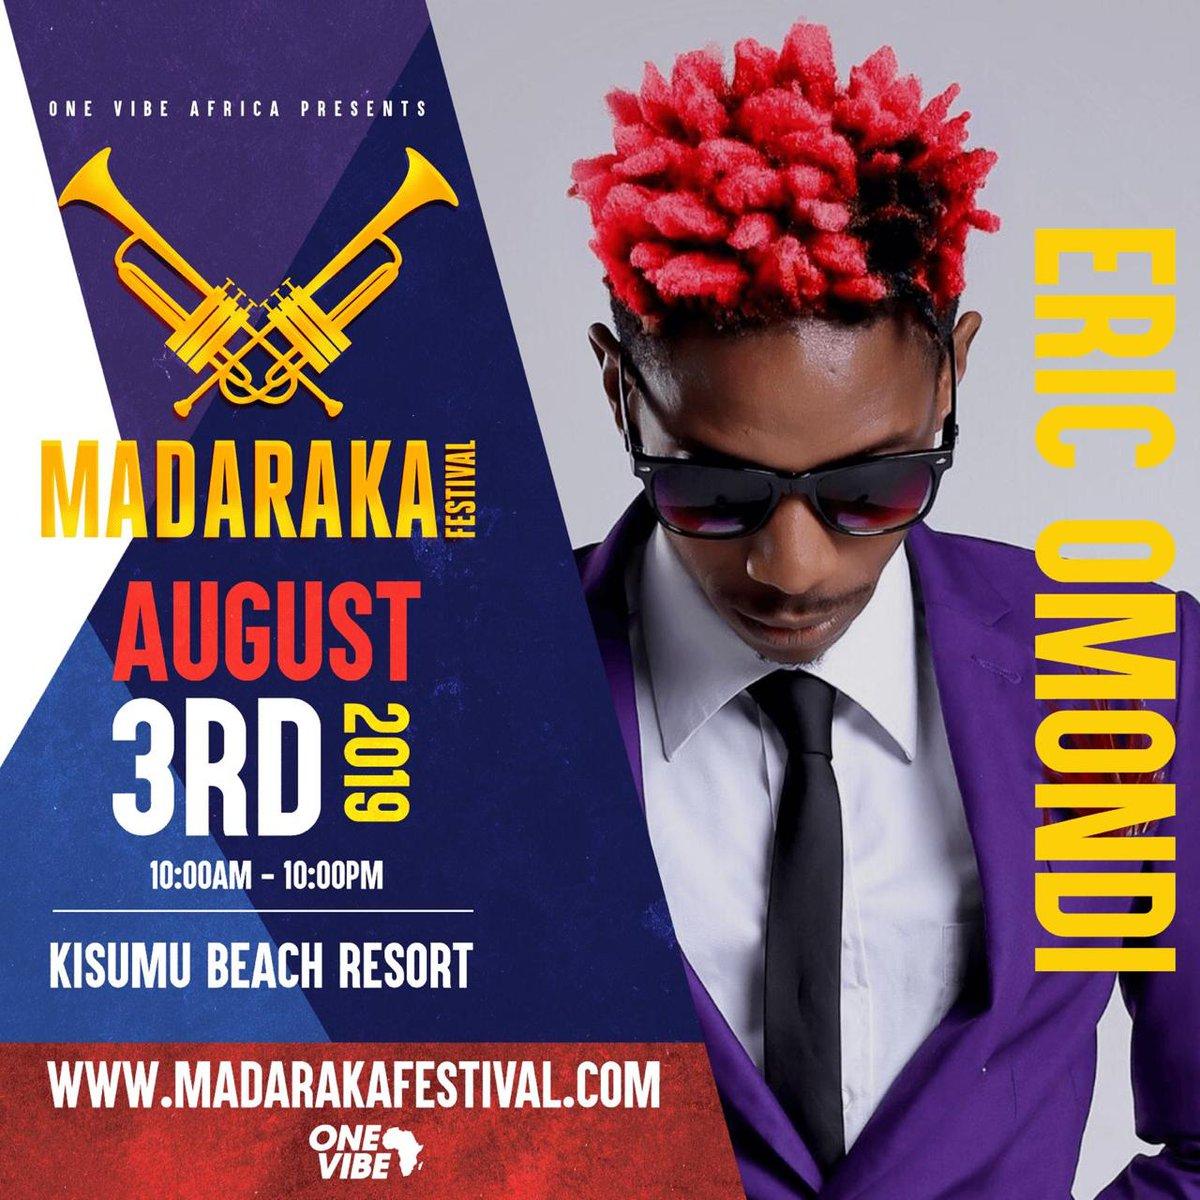 #MadarakaFest2019 Issa date